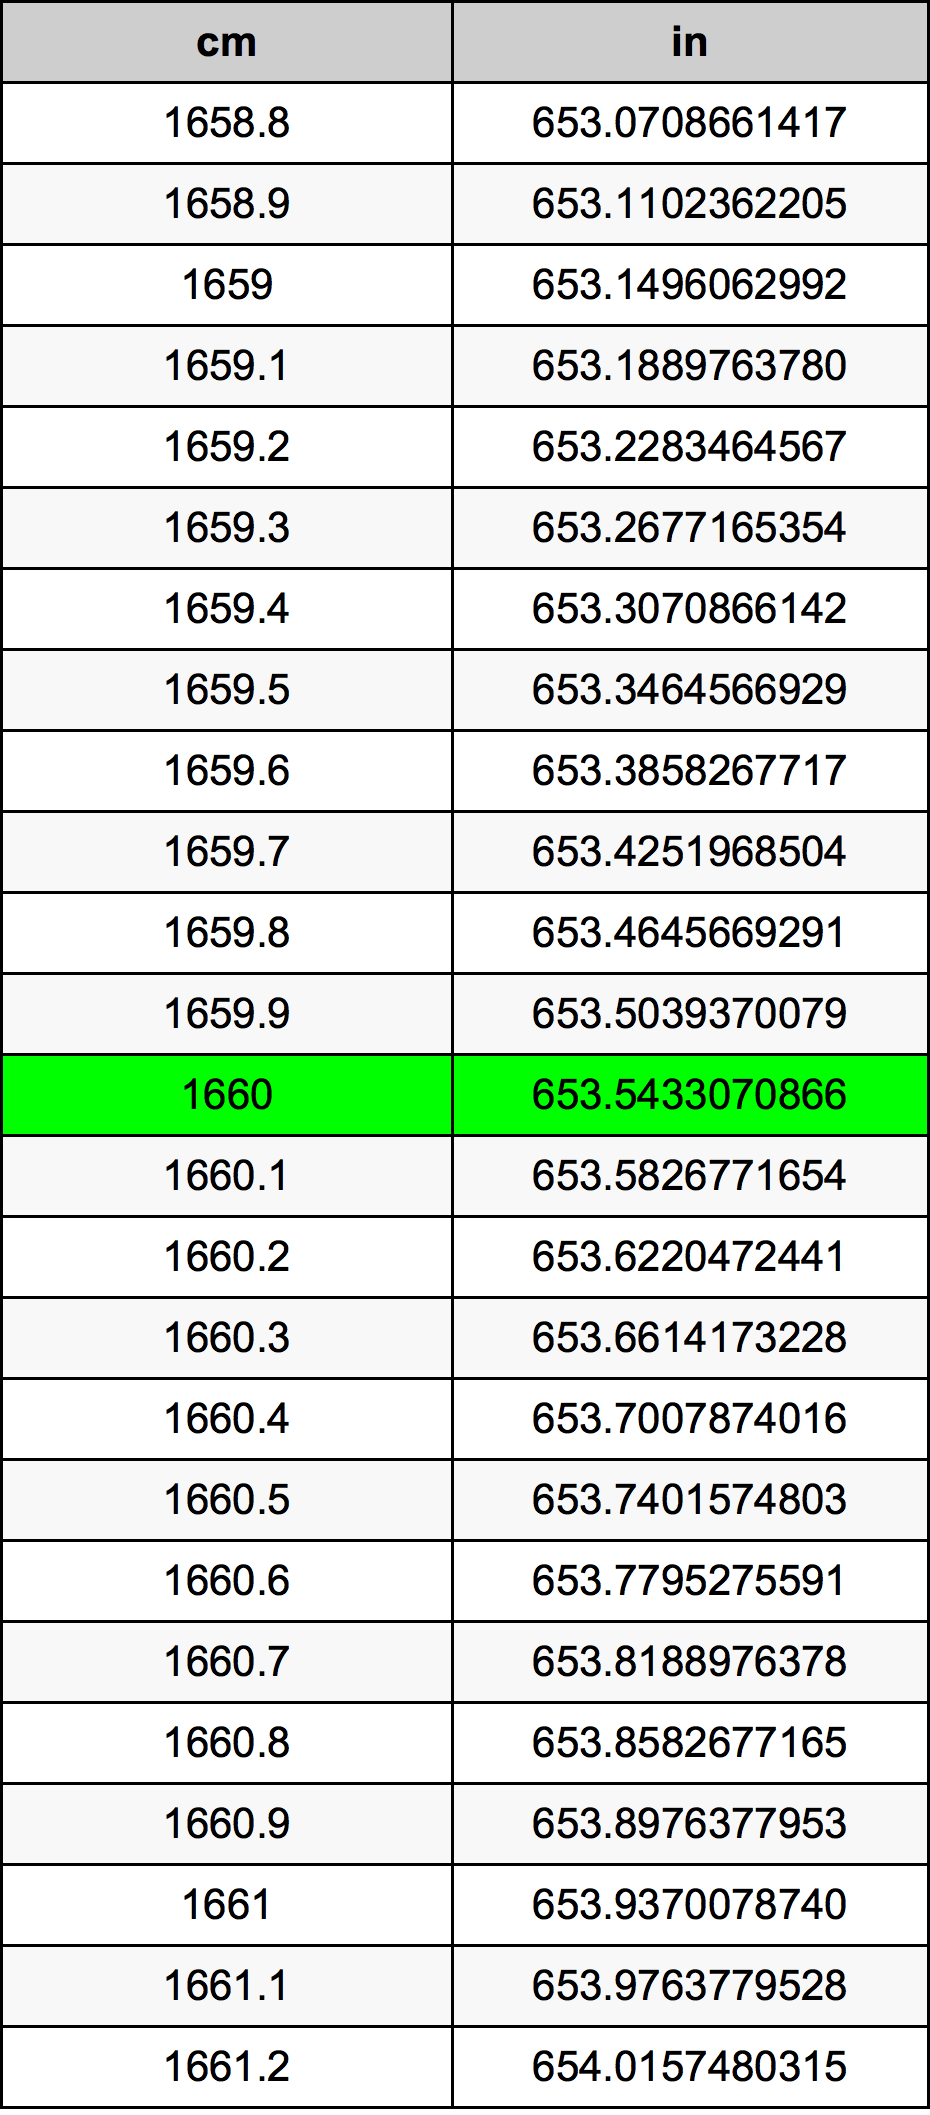 1660 Centimeter Table